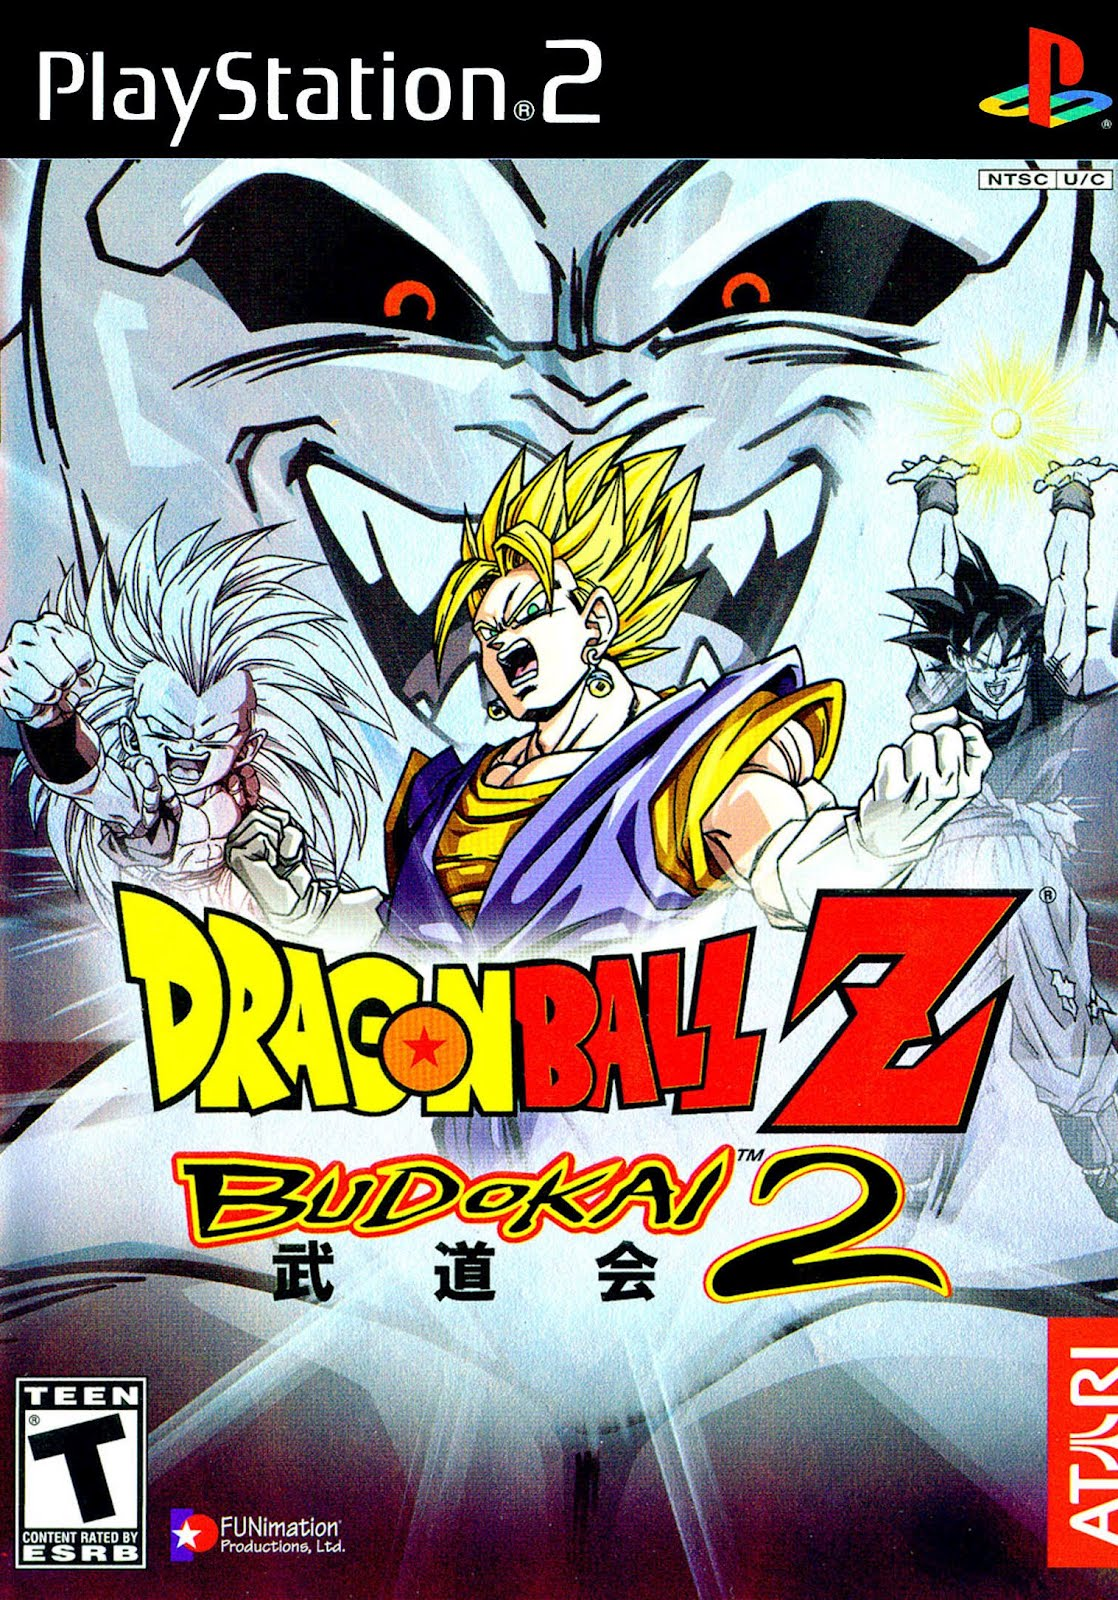 download game dragon ball z budokai 2 ps2 poelbam pintar